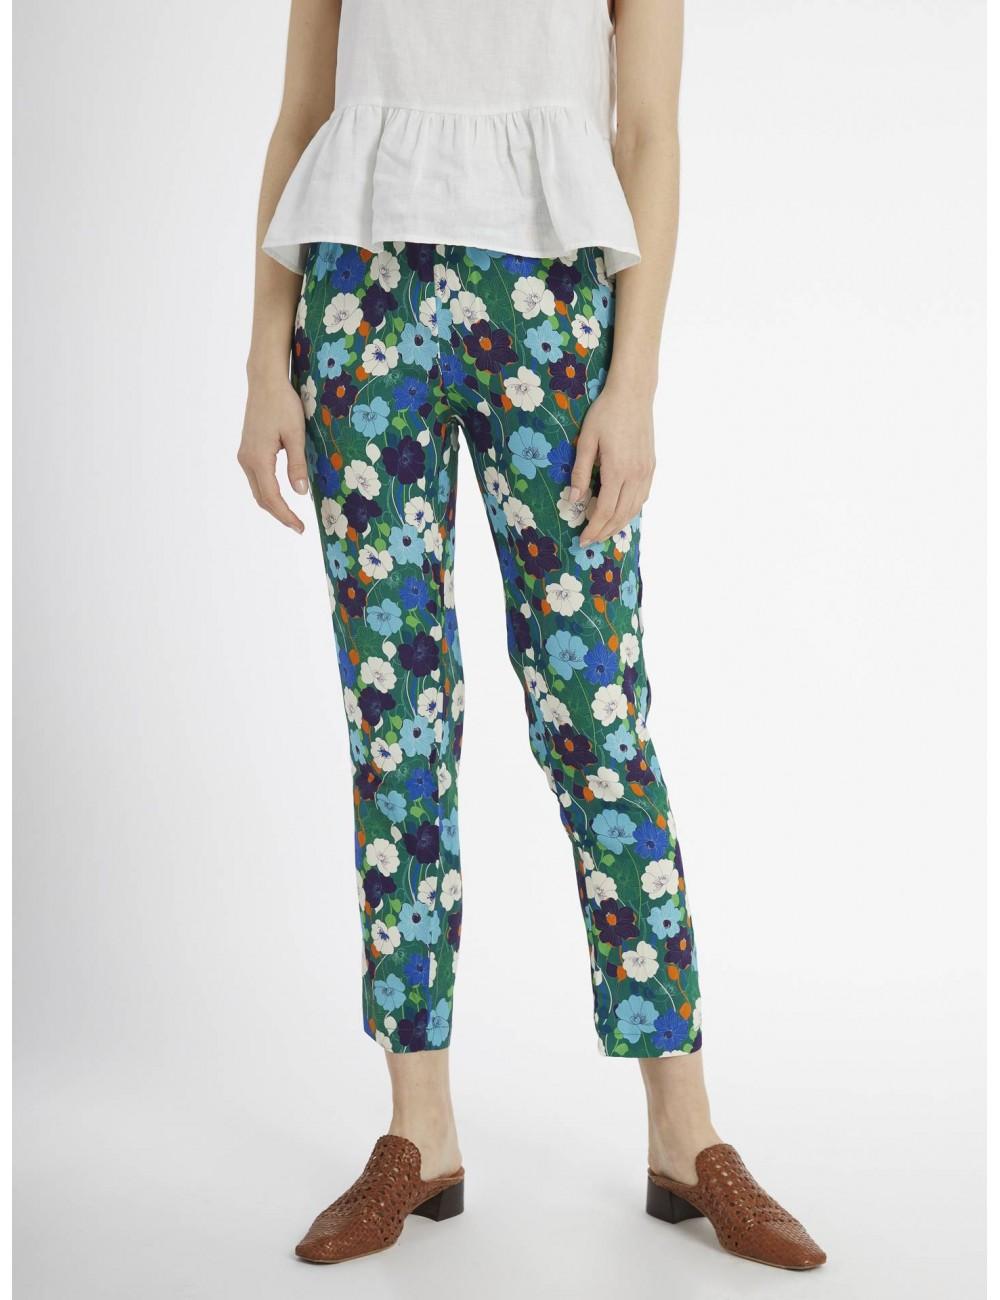 c6c977cc22 Pantalón estampado flores - MAAZi